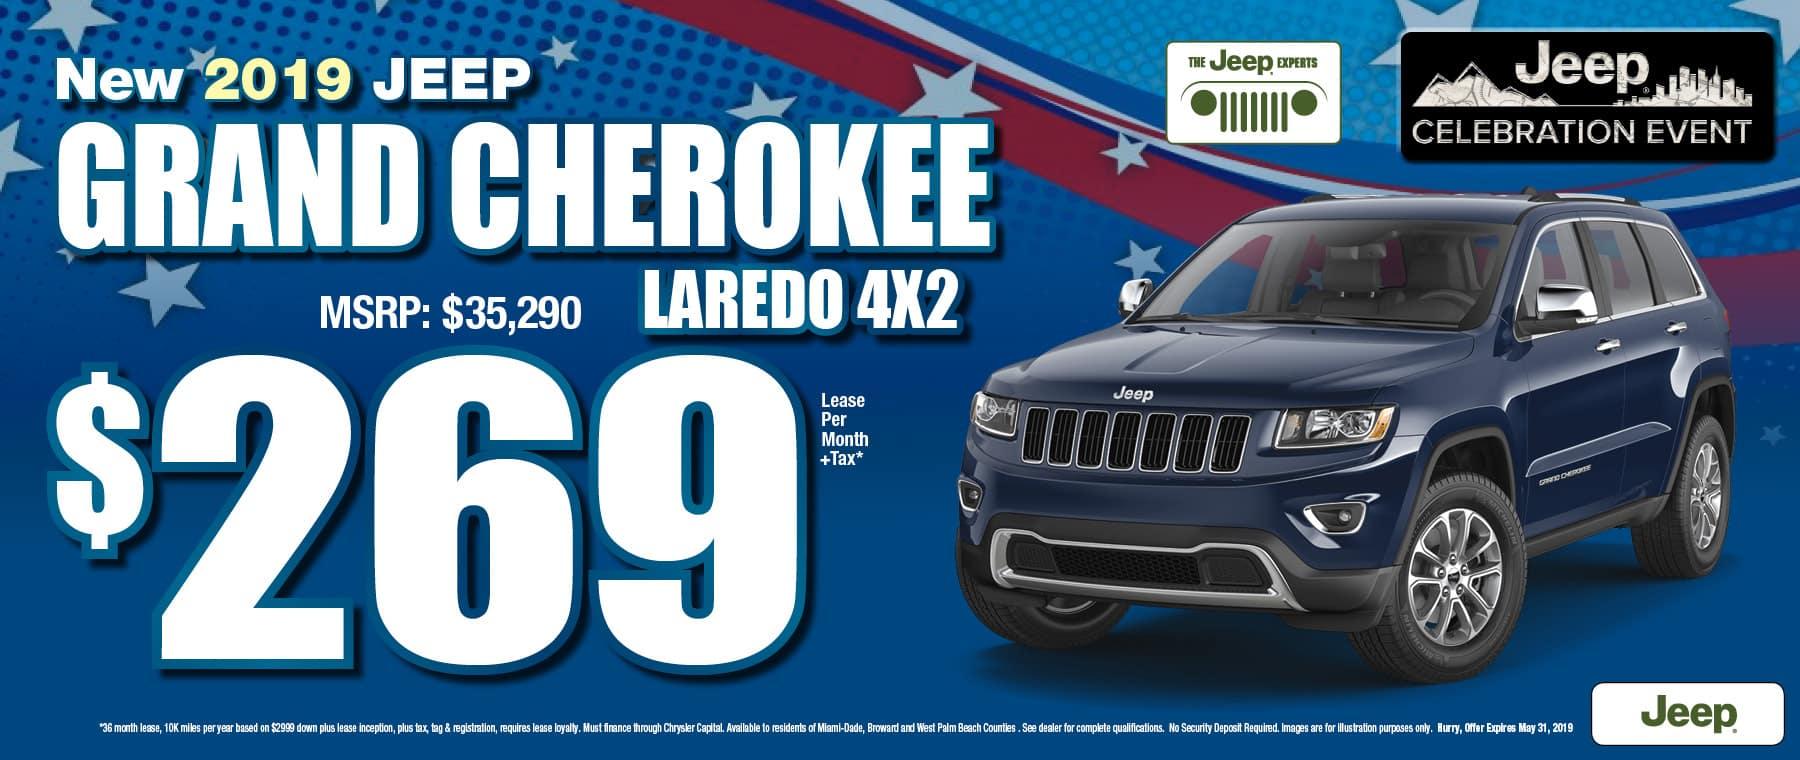 Grand Cherokee $269 Lease